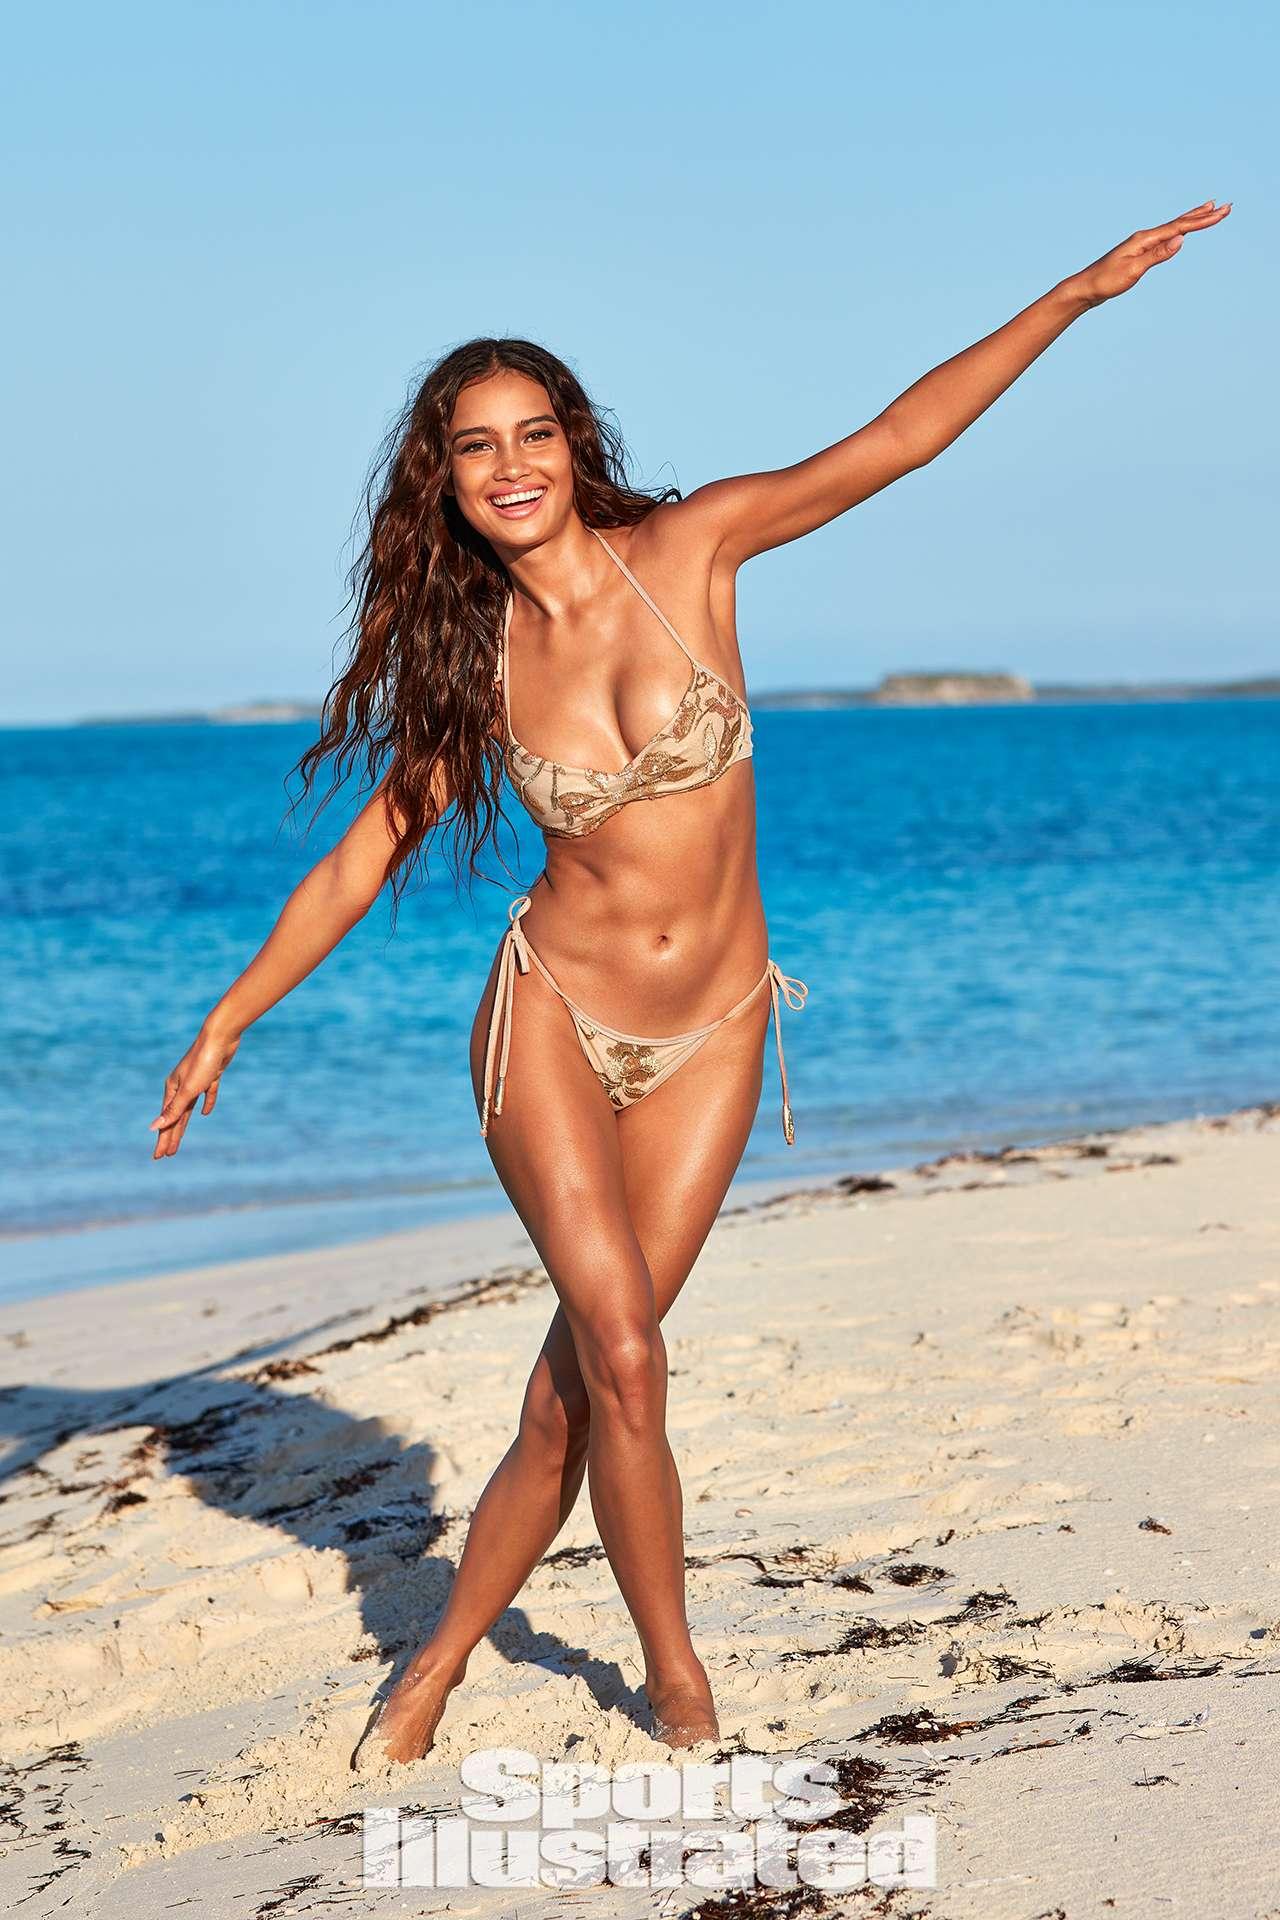 Great Exuma: Kelsey Merritt für die Sports Illustrated Swimsuit Issue 20